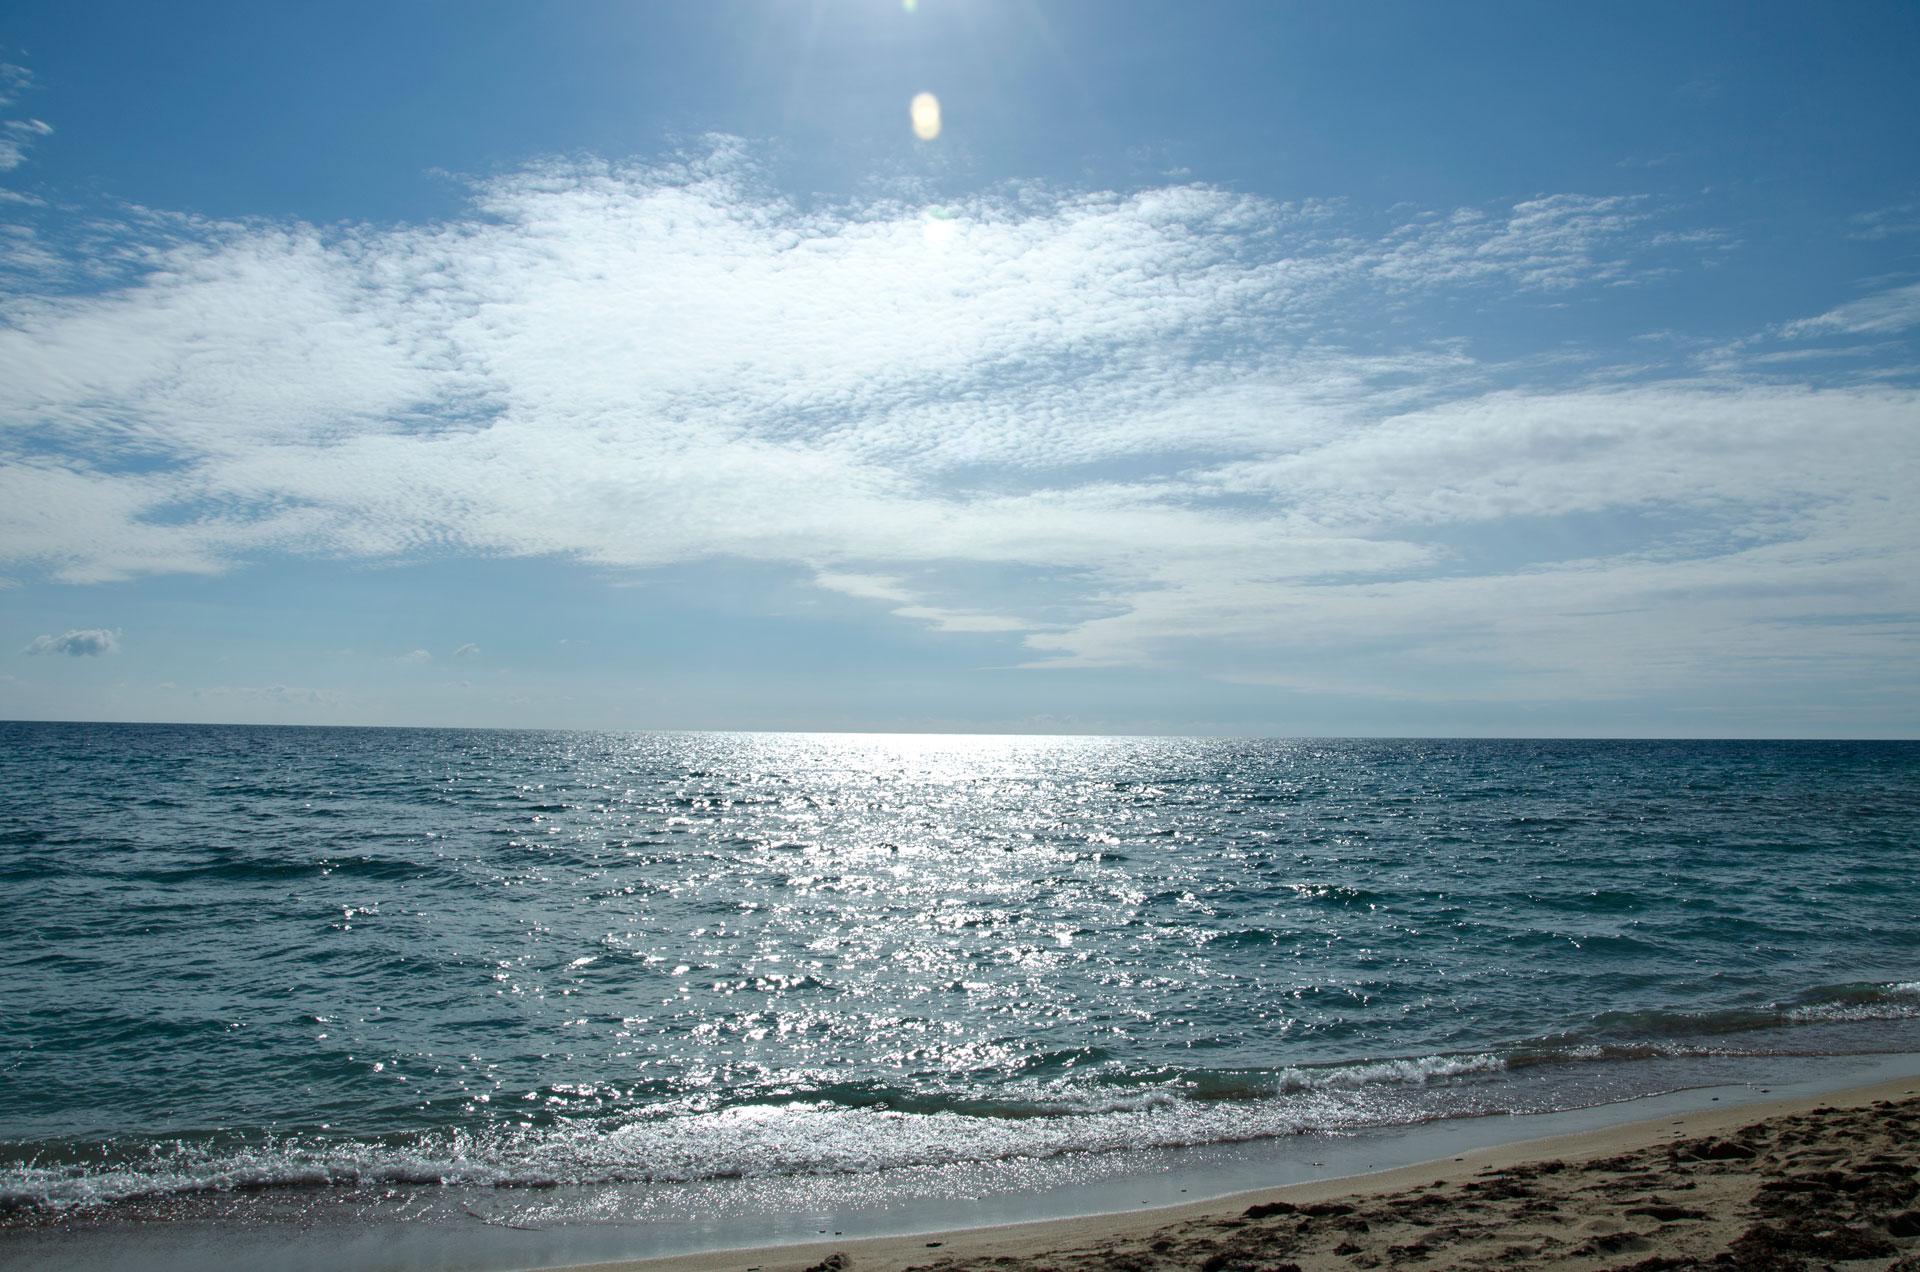 Море в марте. Фото Молочного